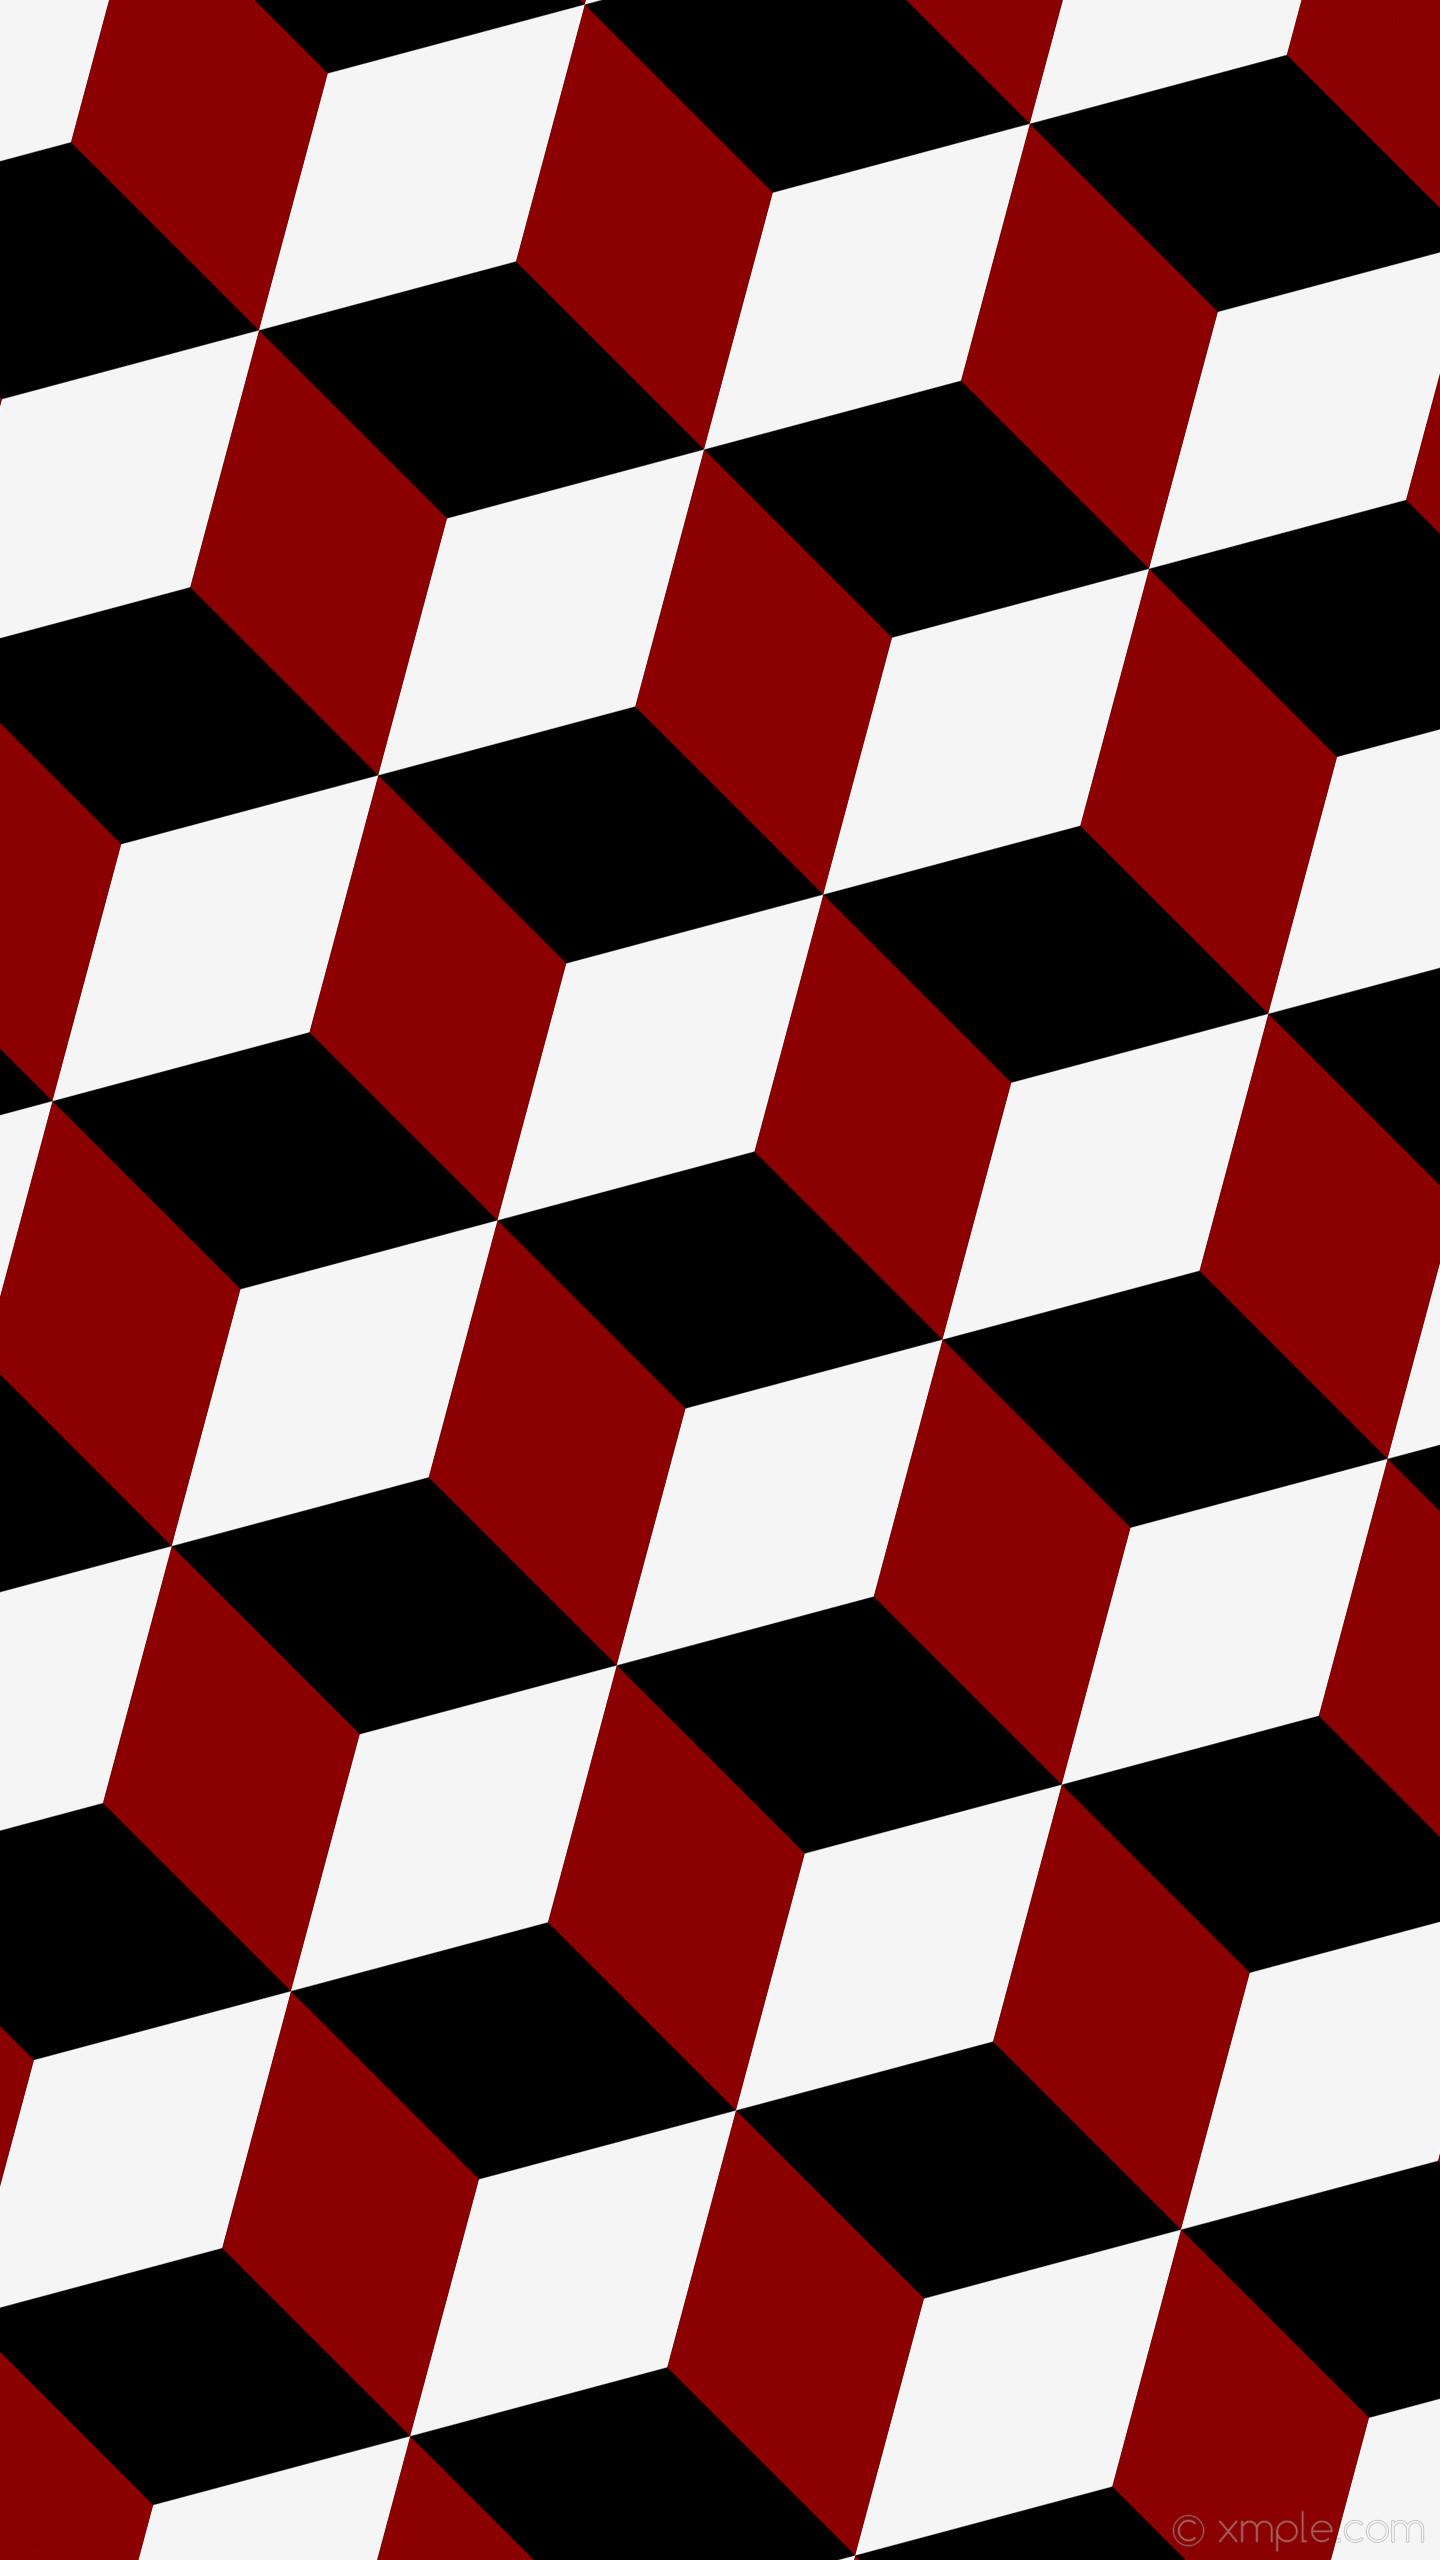 wallpaper red 3d cubes white black dark red white smoke #000000 #8b0000  #f5f5f5